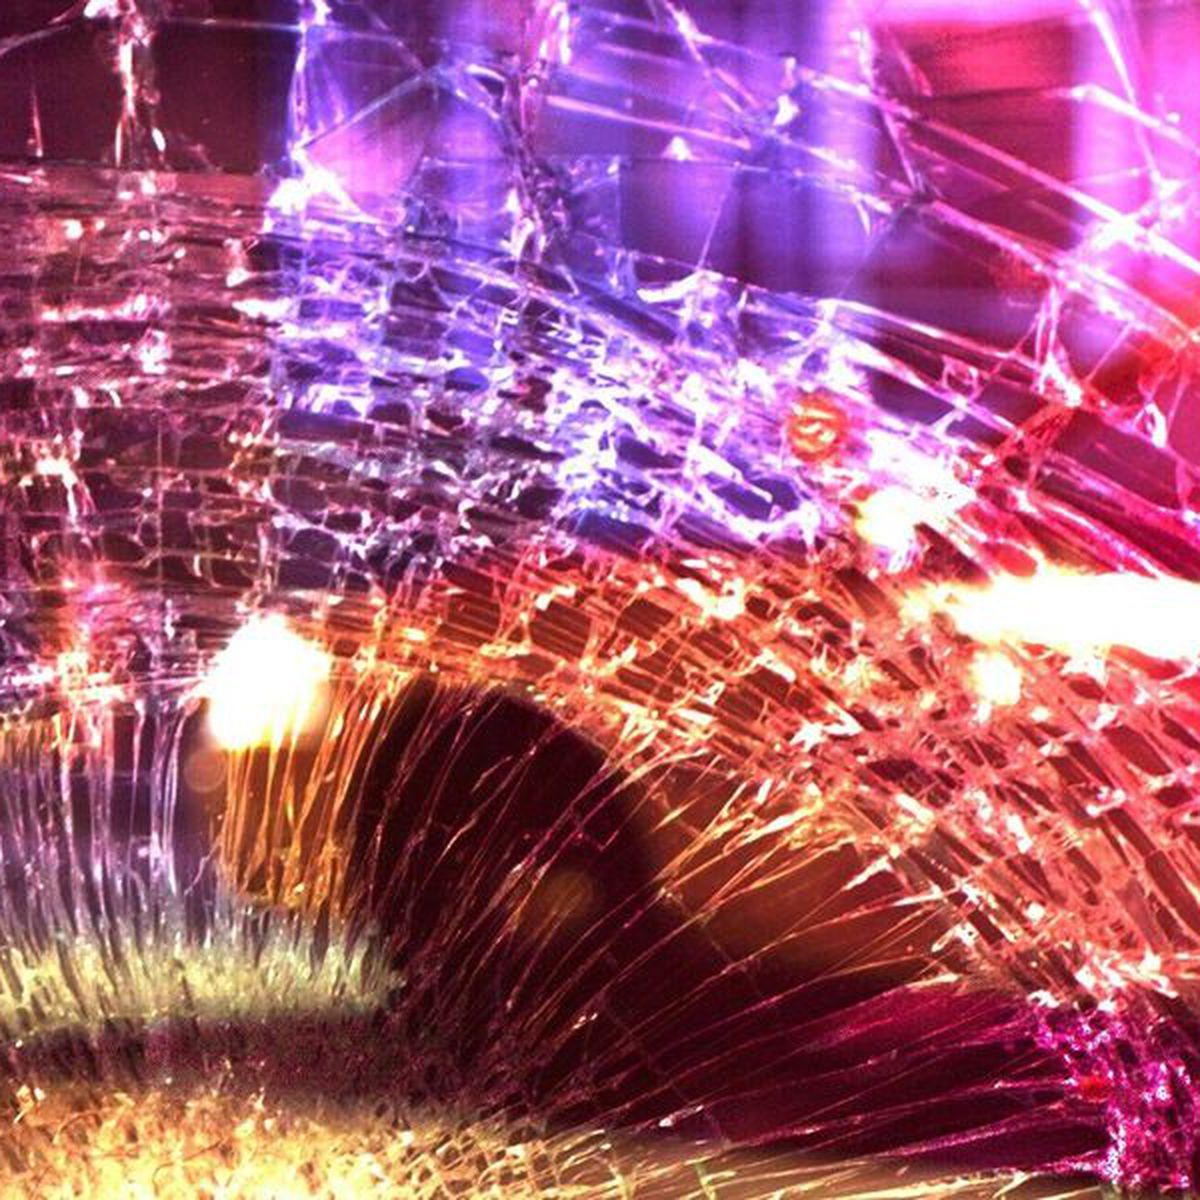 North Carolina woman dies in Aiken car crash, highway patrol investigating